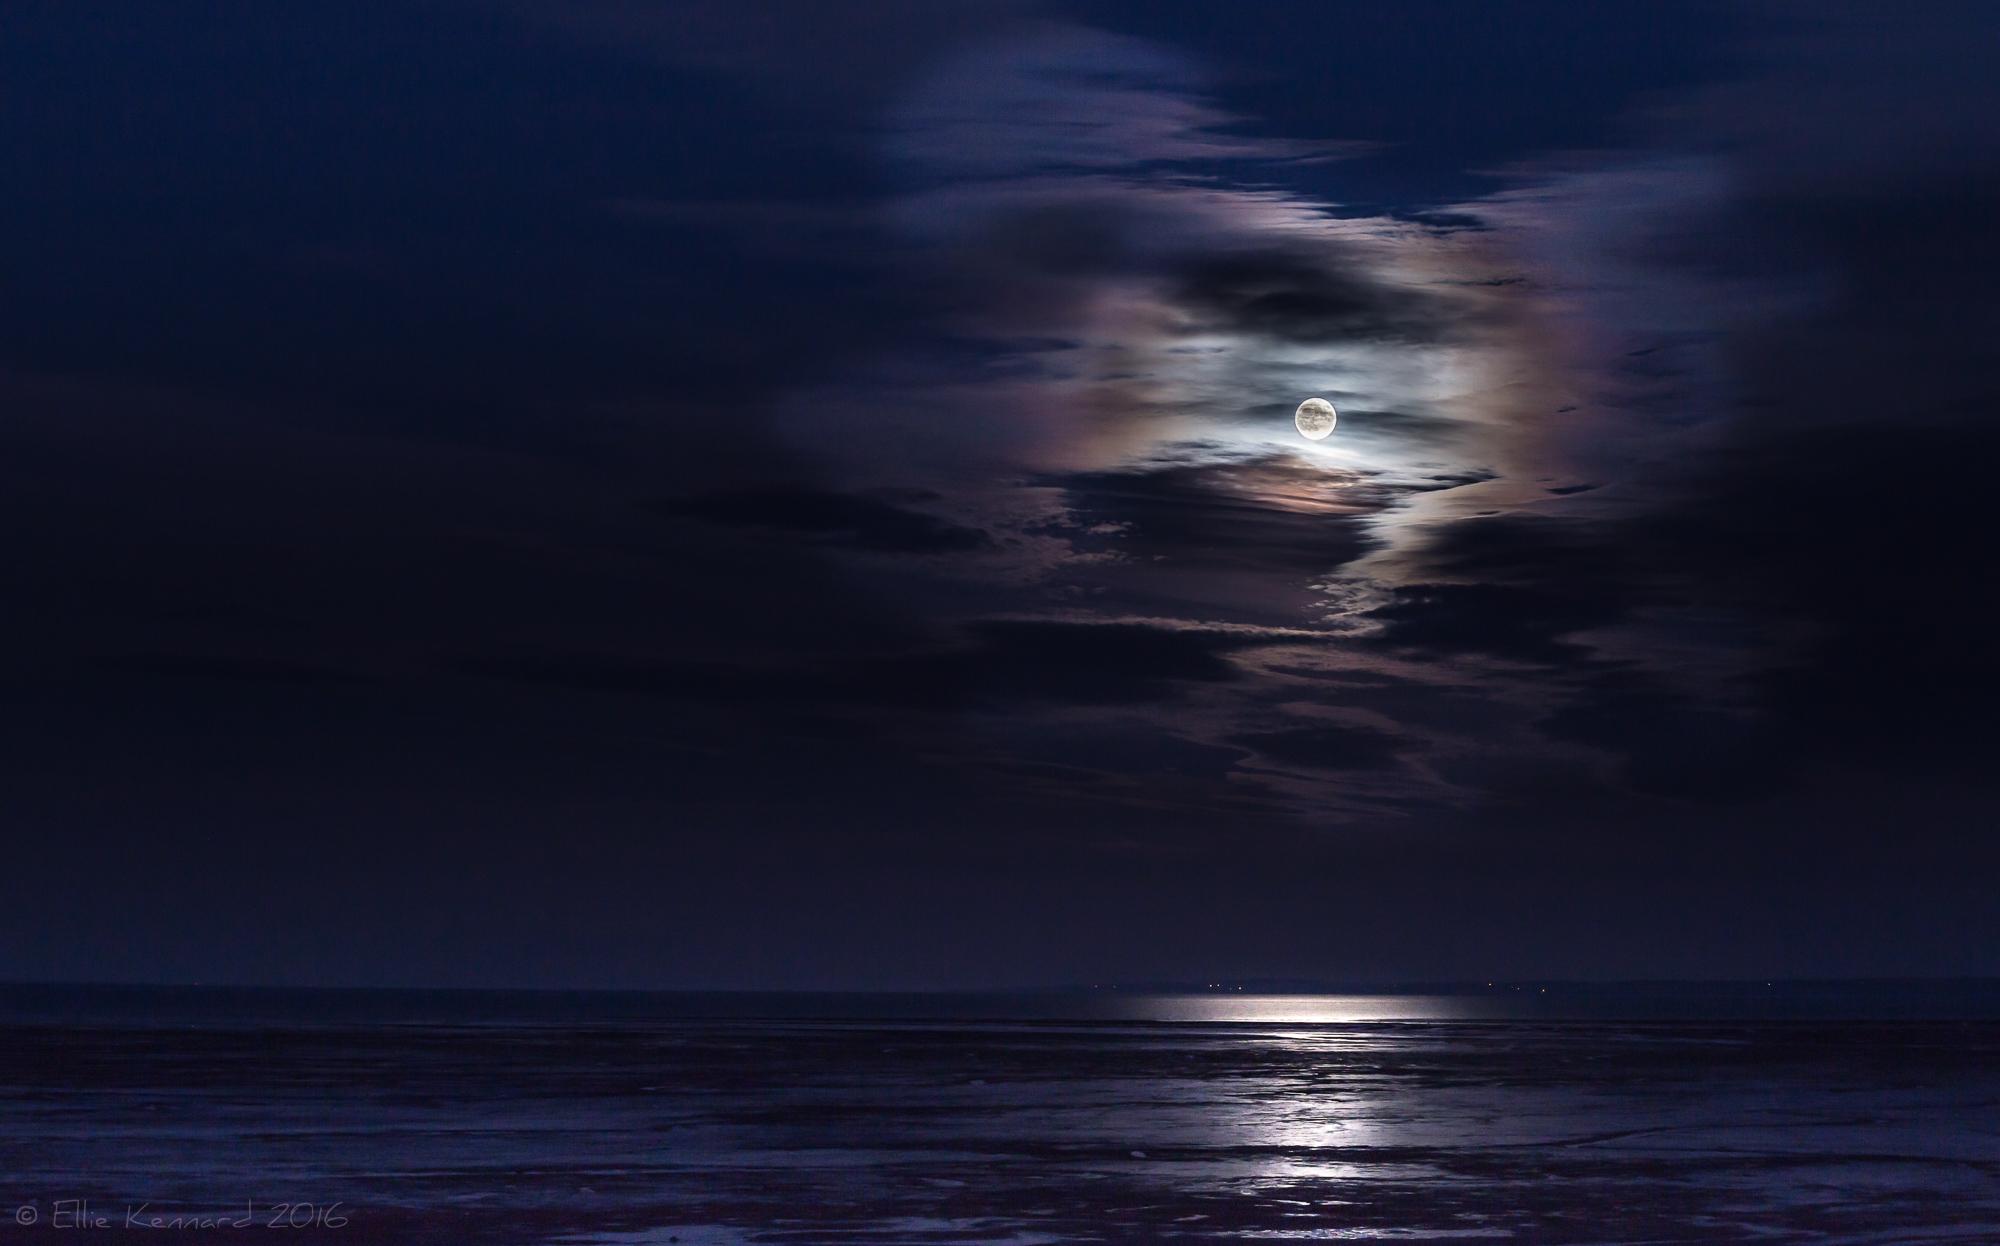 Supermoon with Clouds, Minas Basin, November - Ellie Kennard 2016